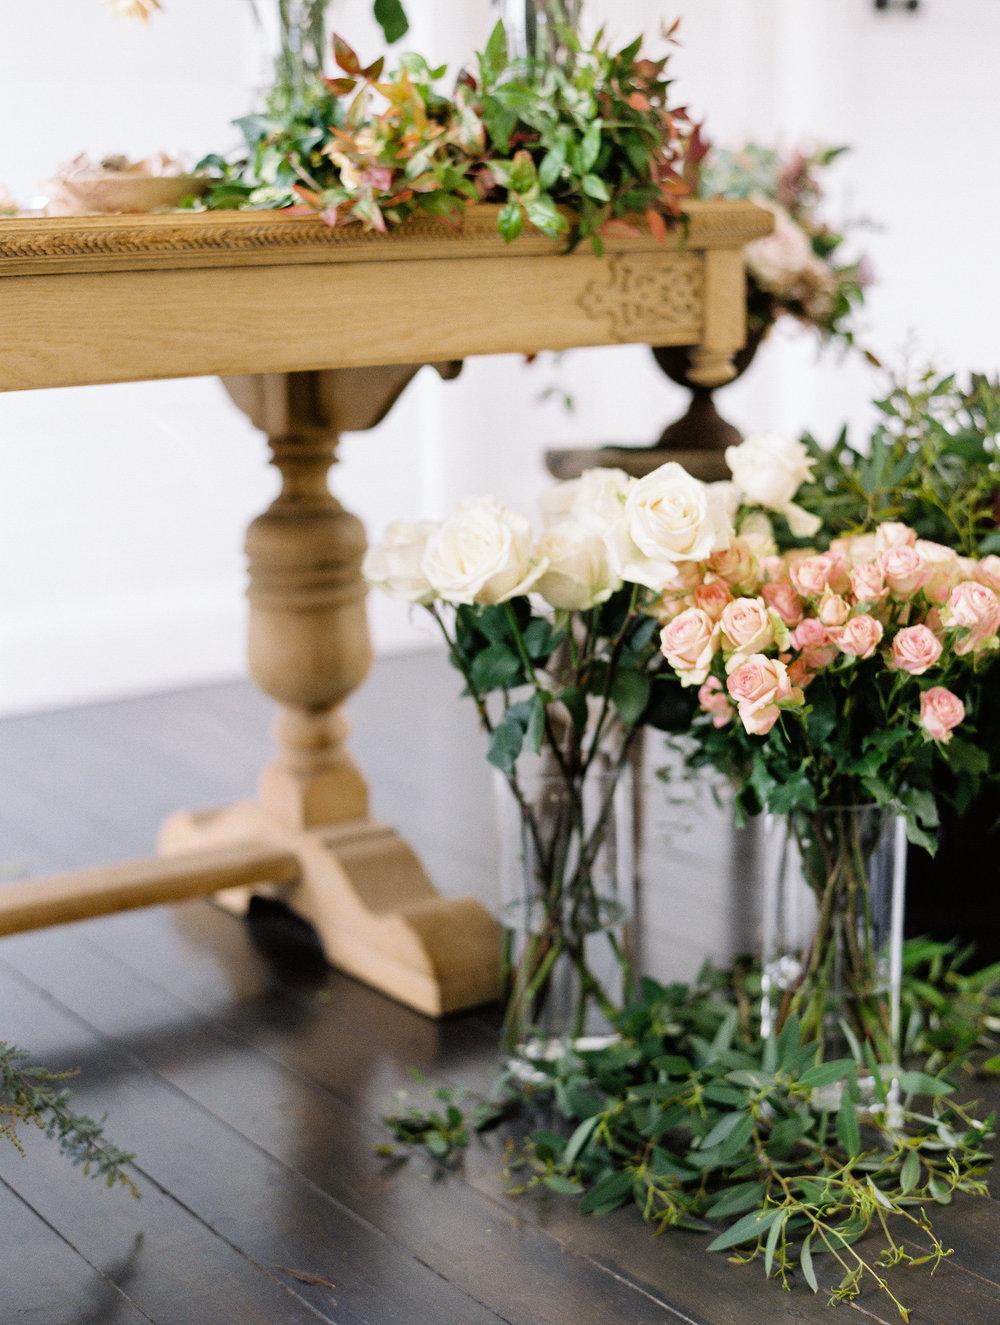 sandra-chau-stylist-floral-florist-branding-lifestyle-shoot-we-are-origami153.jpg